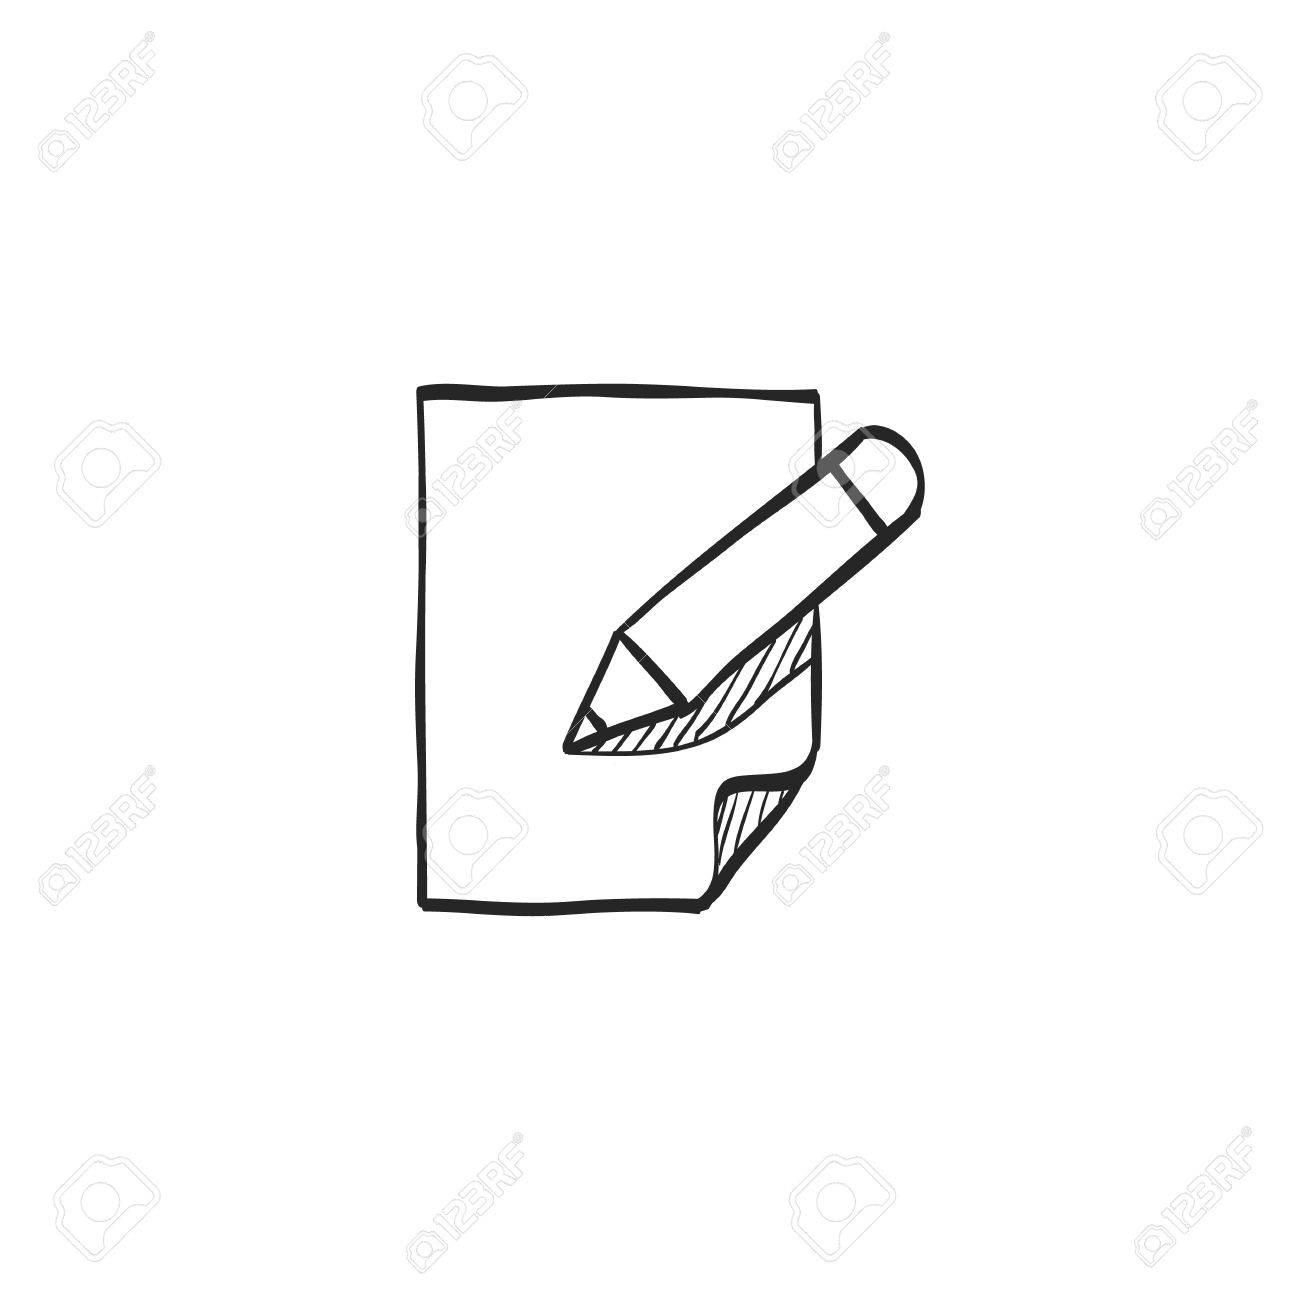 Dokument Bearbeiten Symbol In Doodle-Skizze-Linien. Büro Business ...